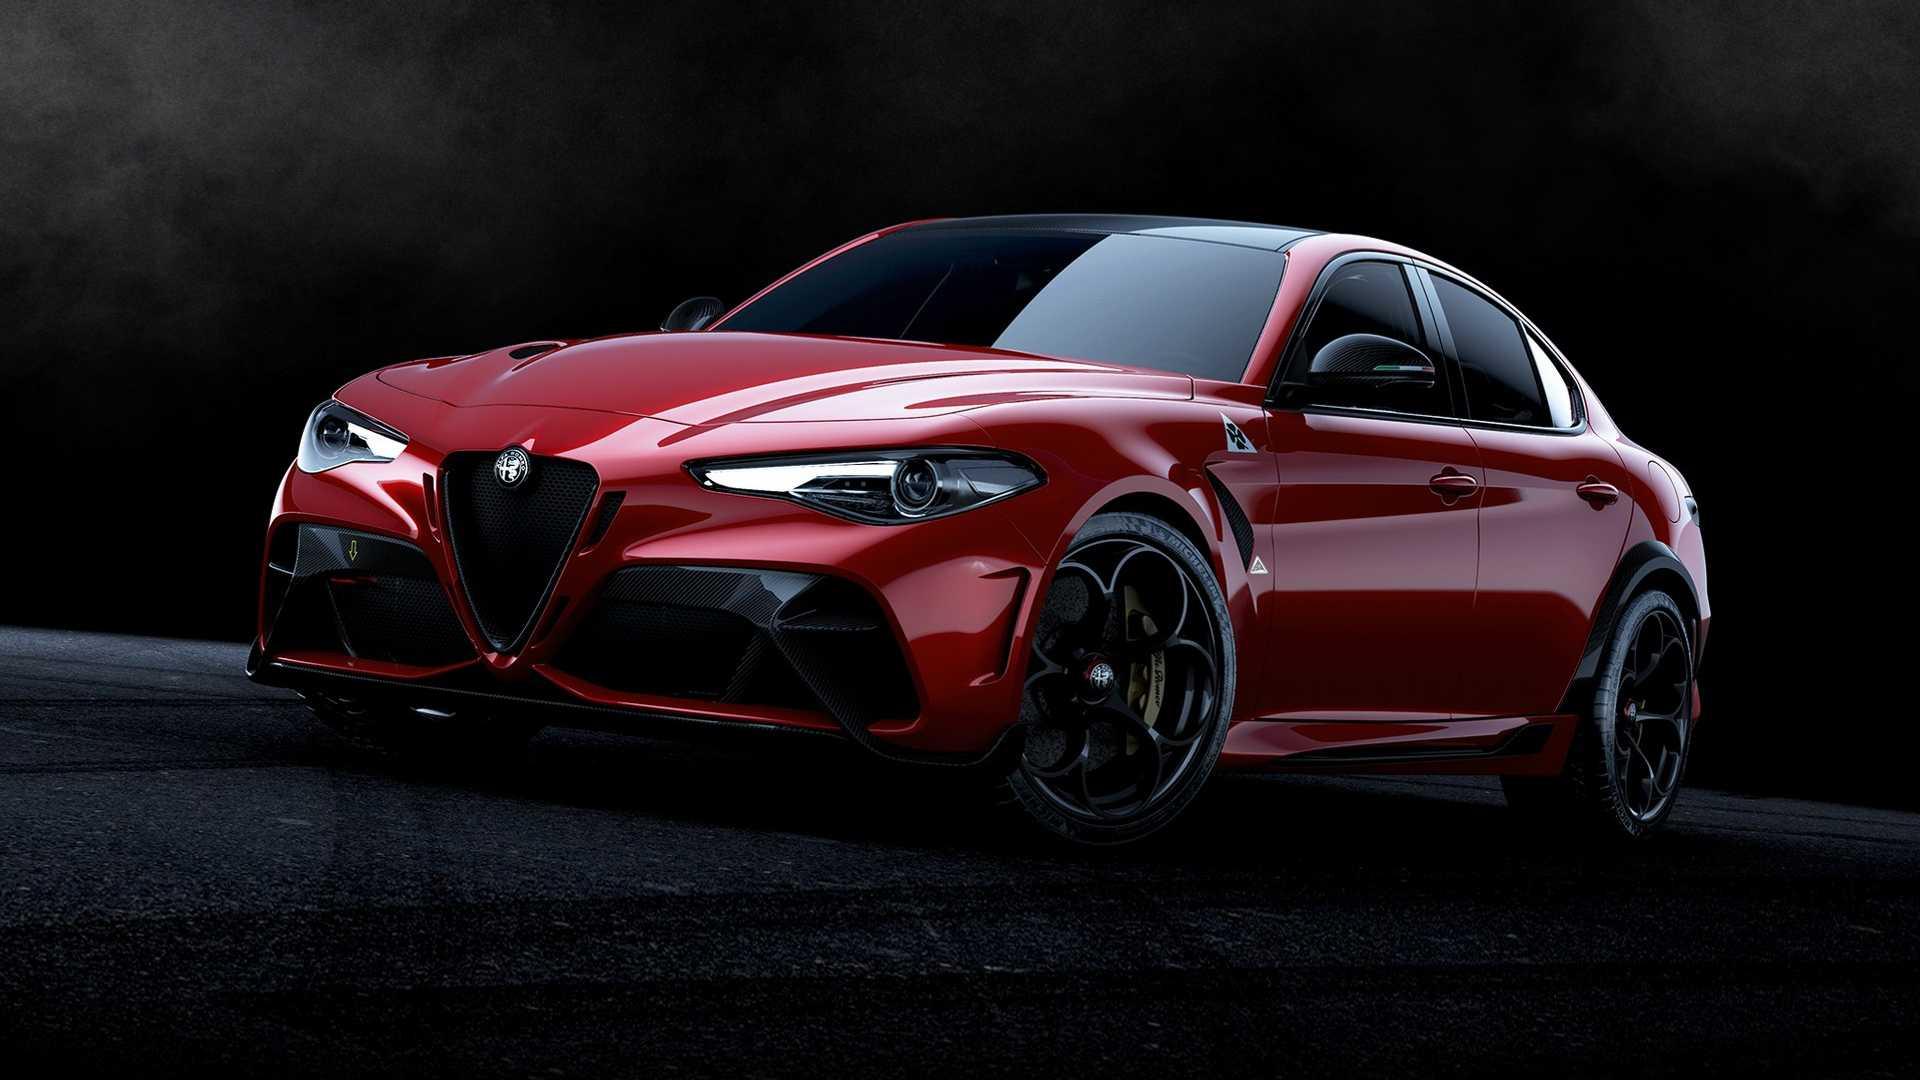 Oficial: Alfa Romeo Giulia GTA, llega el más radical de la casa italiana